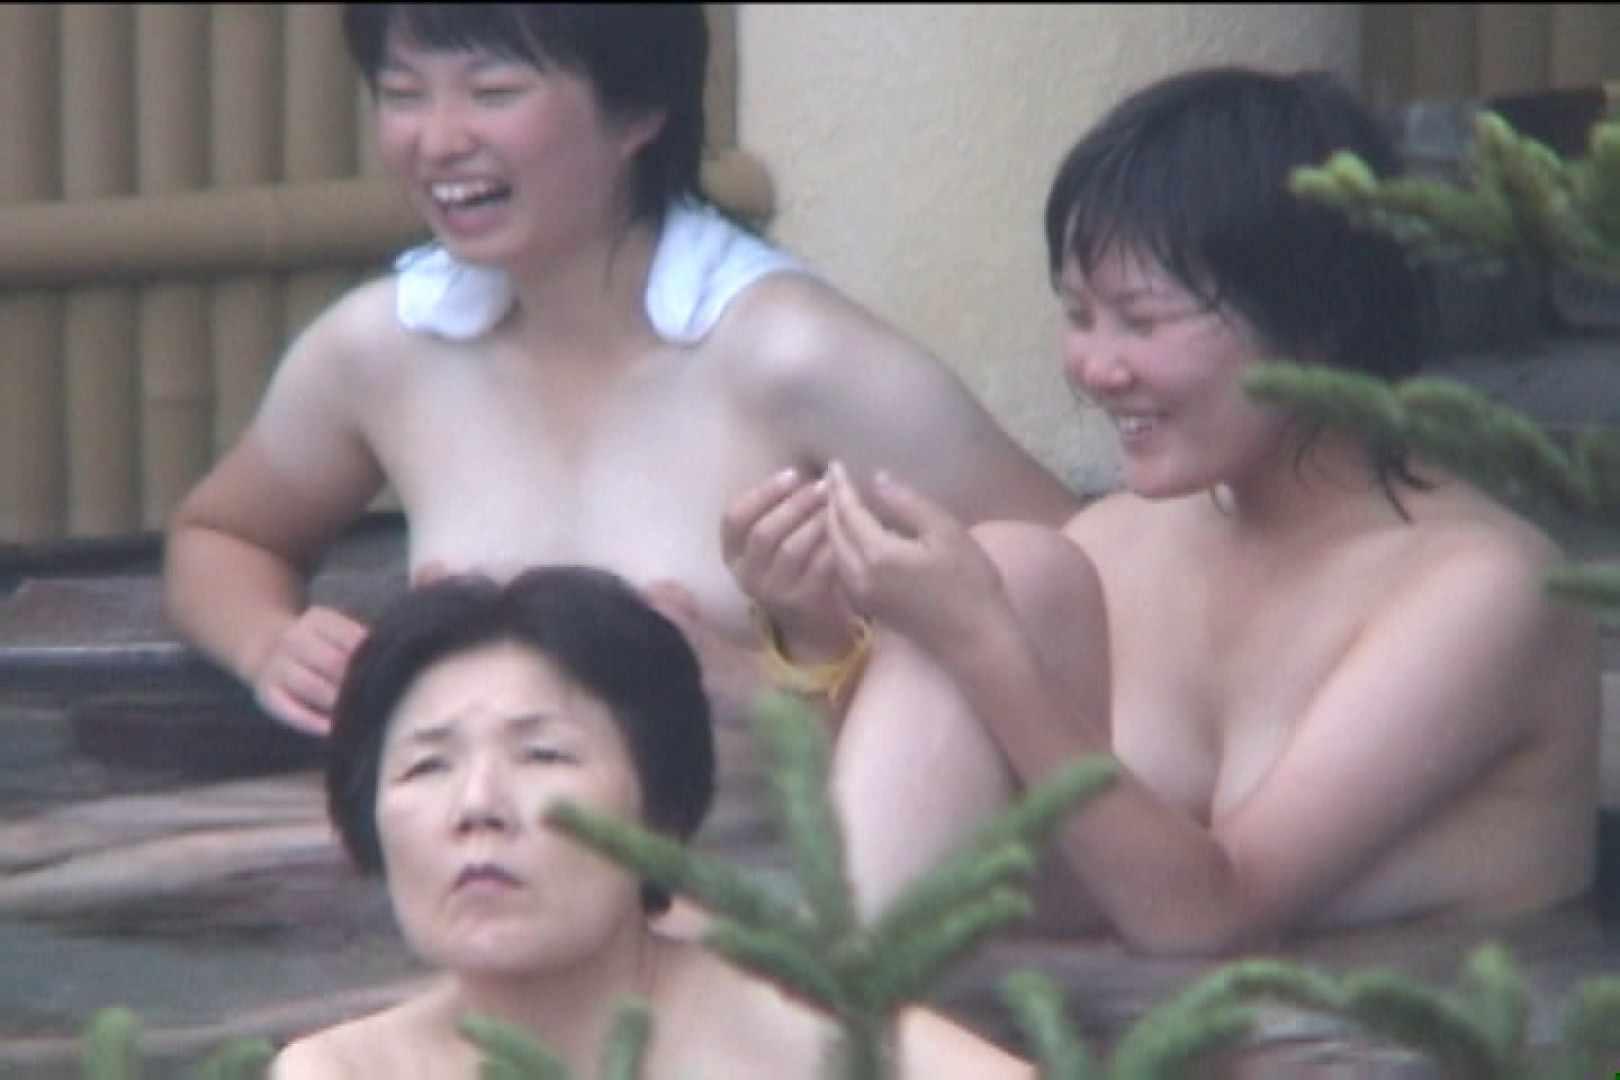 Aquaな露天風呂Vol.99【VIP限定】 露天風呂編  108PIX 44